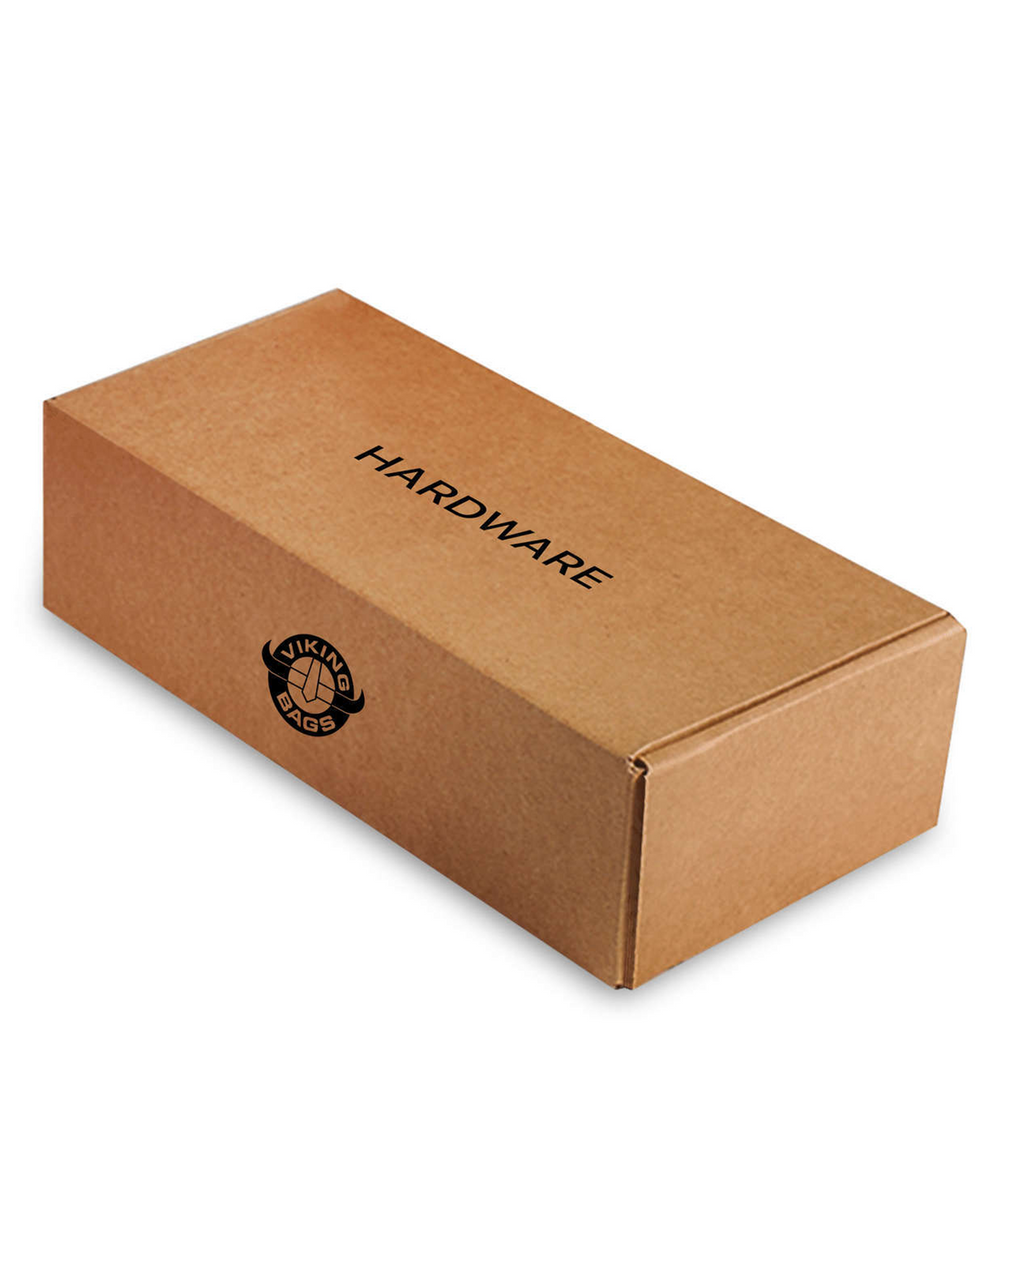 Triumph Rocket III Roadster Charger Single Strap Studded Medium Motorcycle Saddlebags Box